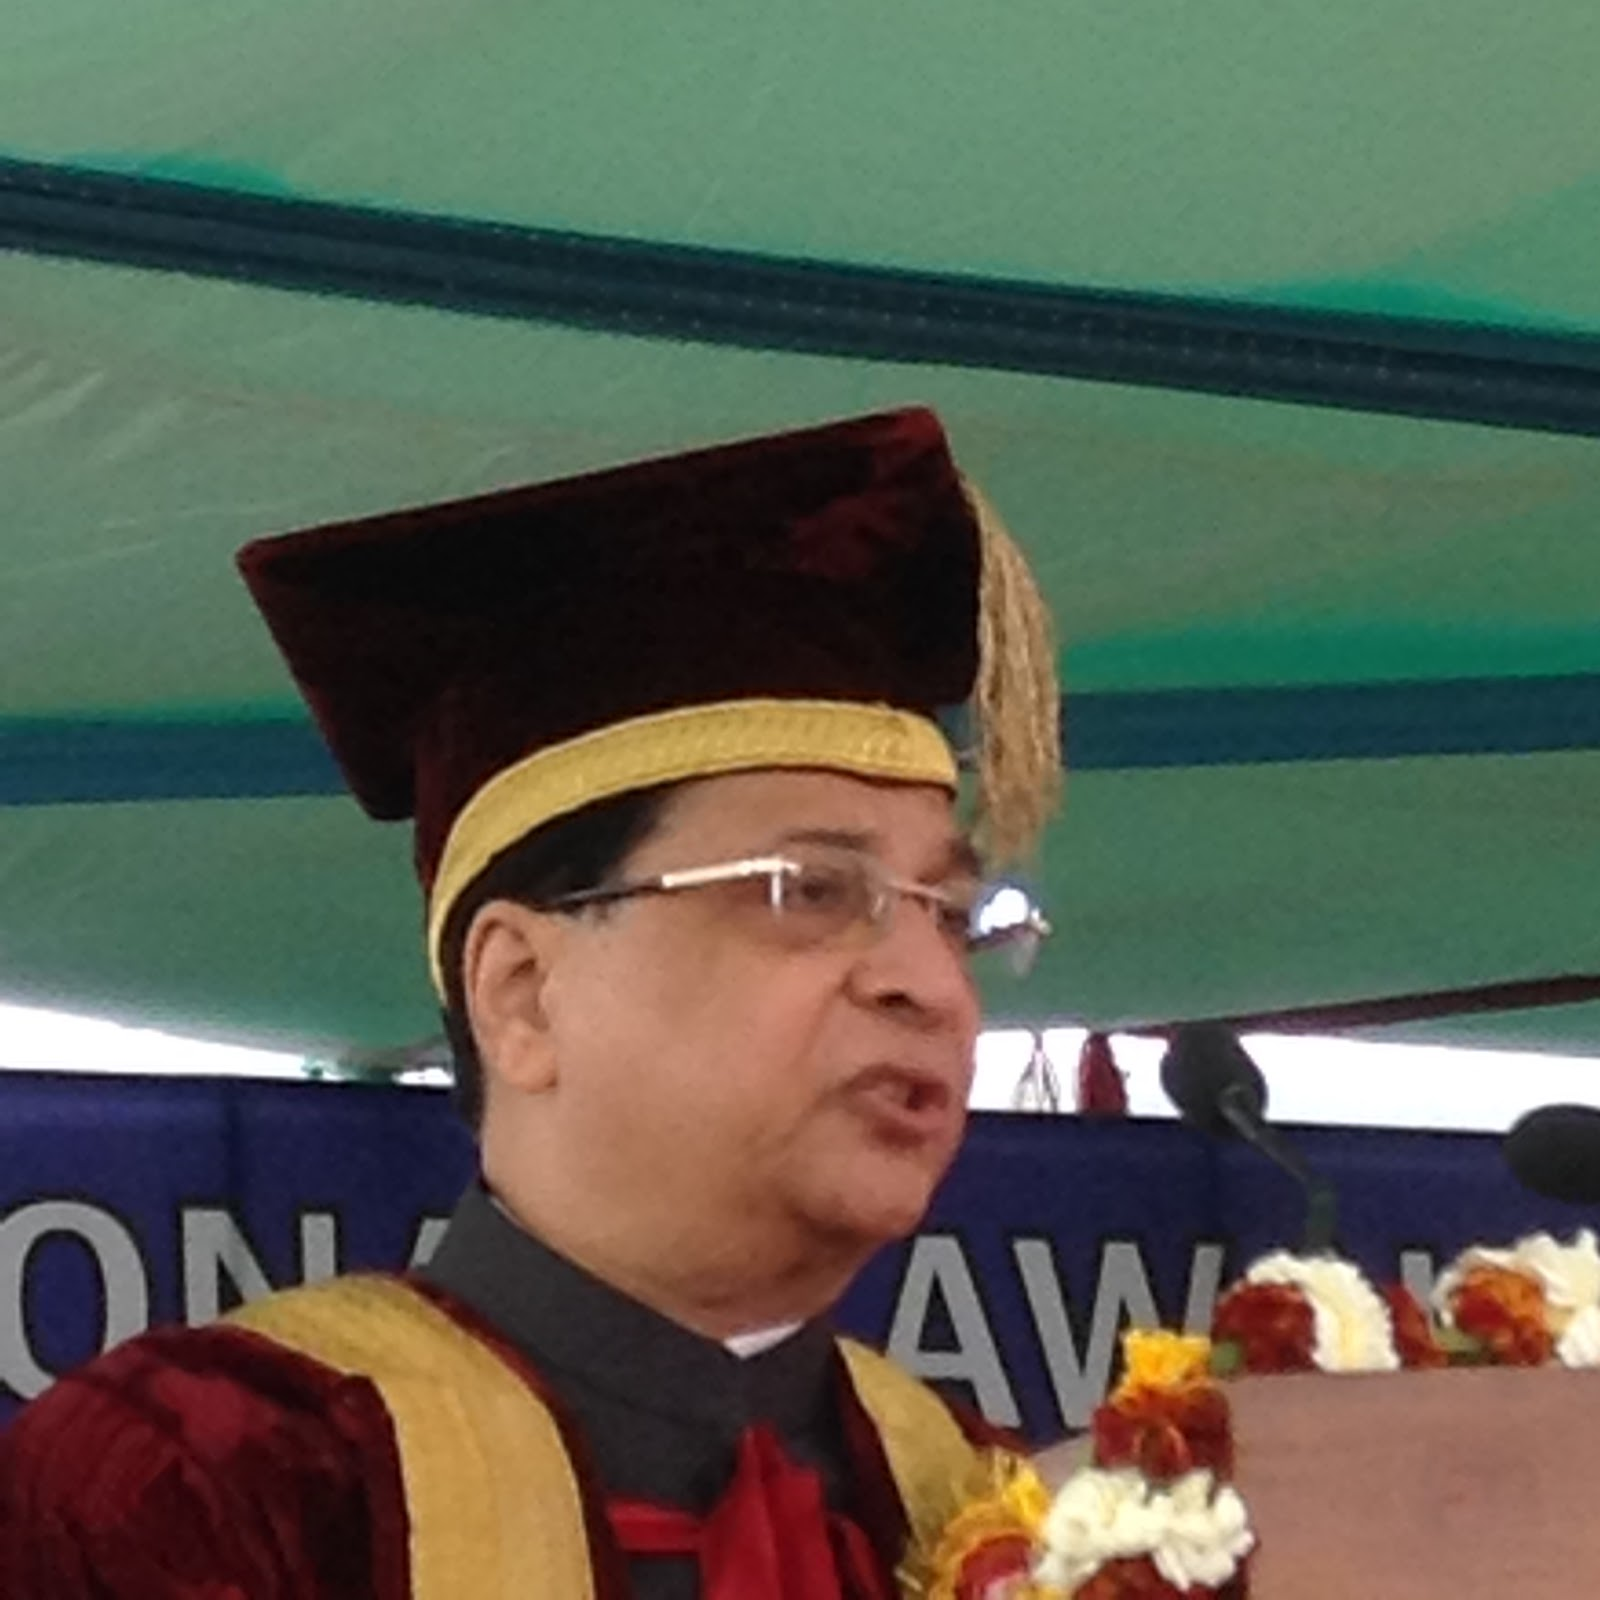 prasar bharati parivar honourable justice deepak misra judge this year the xth convocation address was delivered by honourable justice deepak